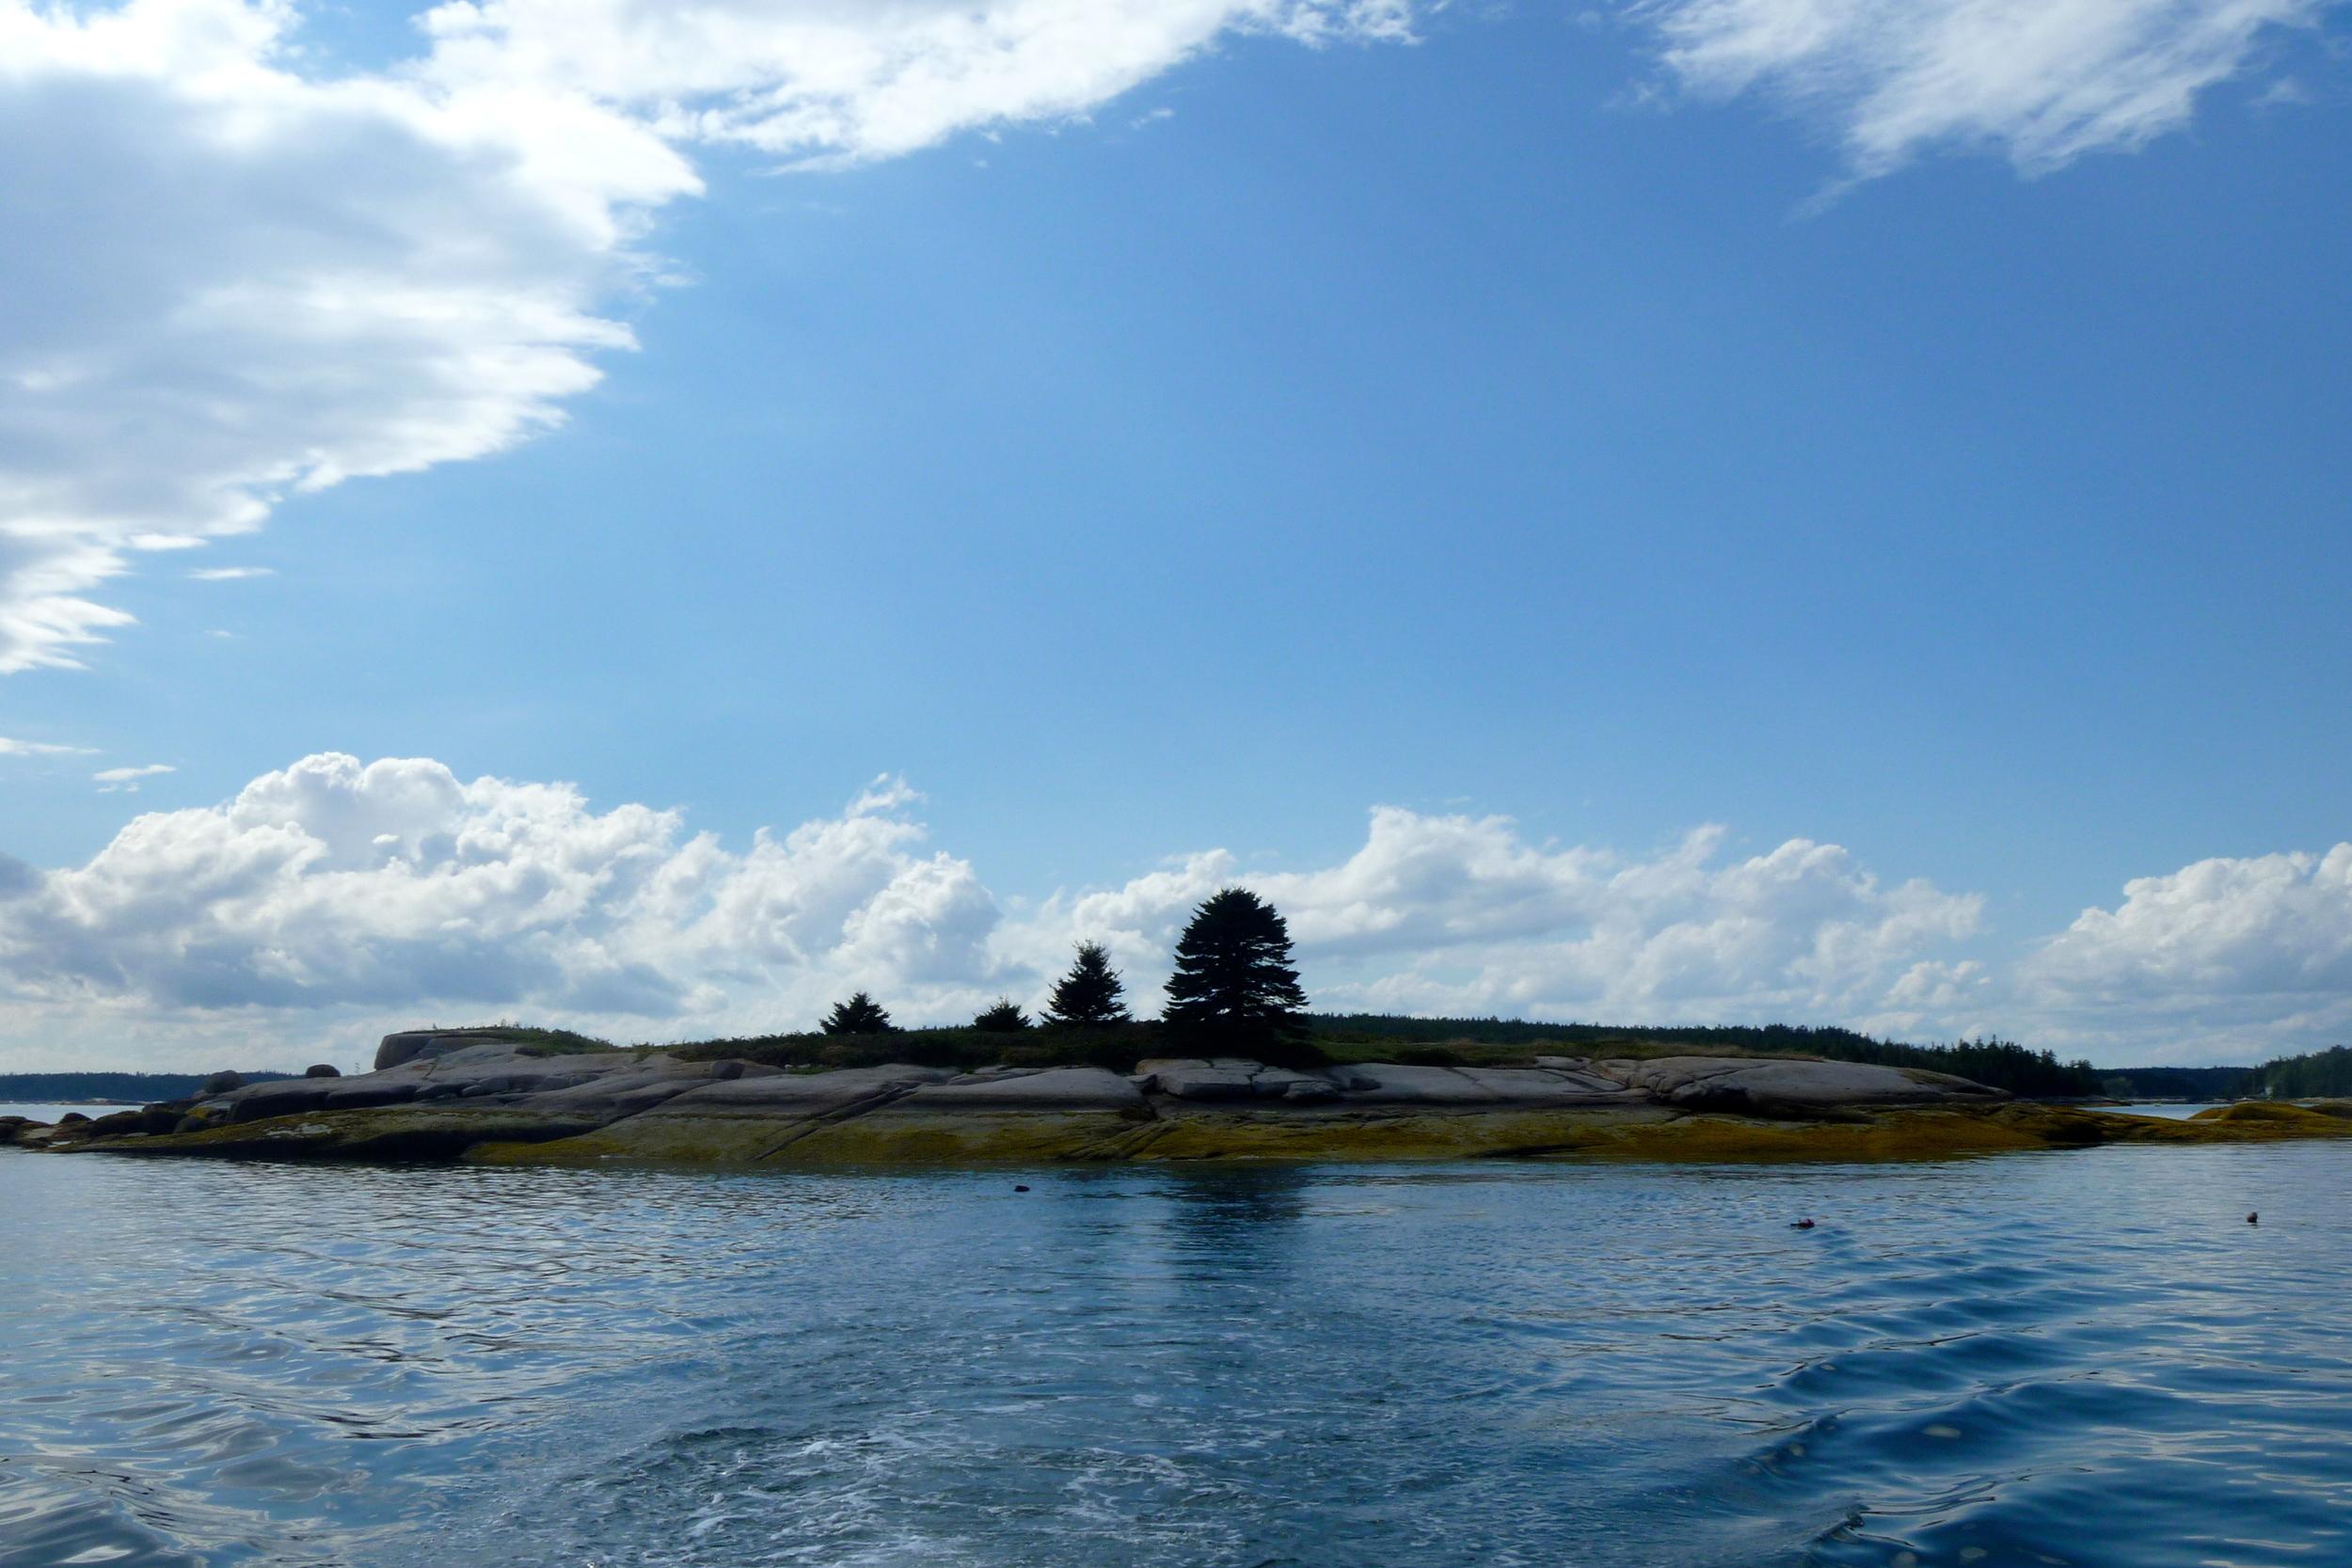 islands2.JPG